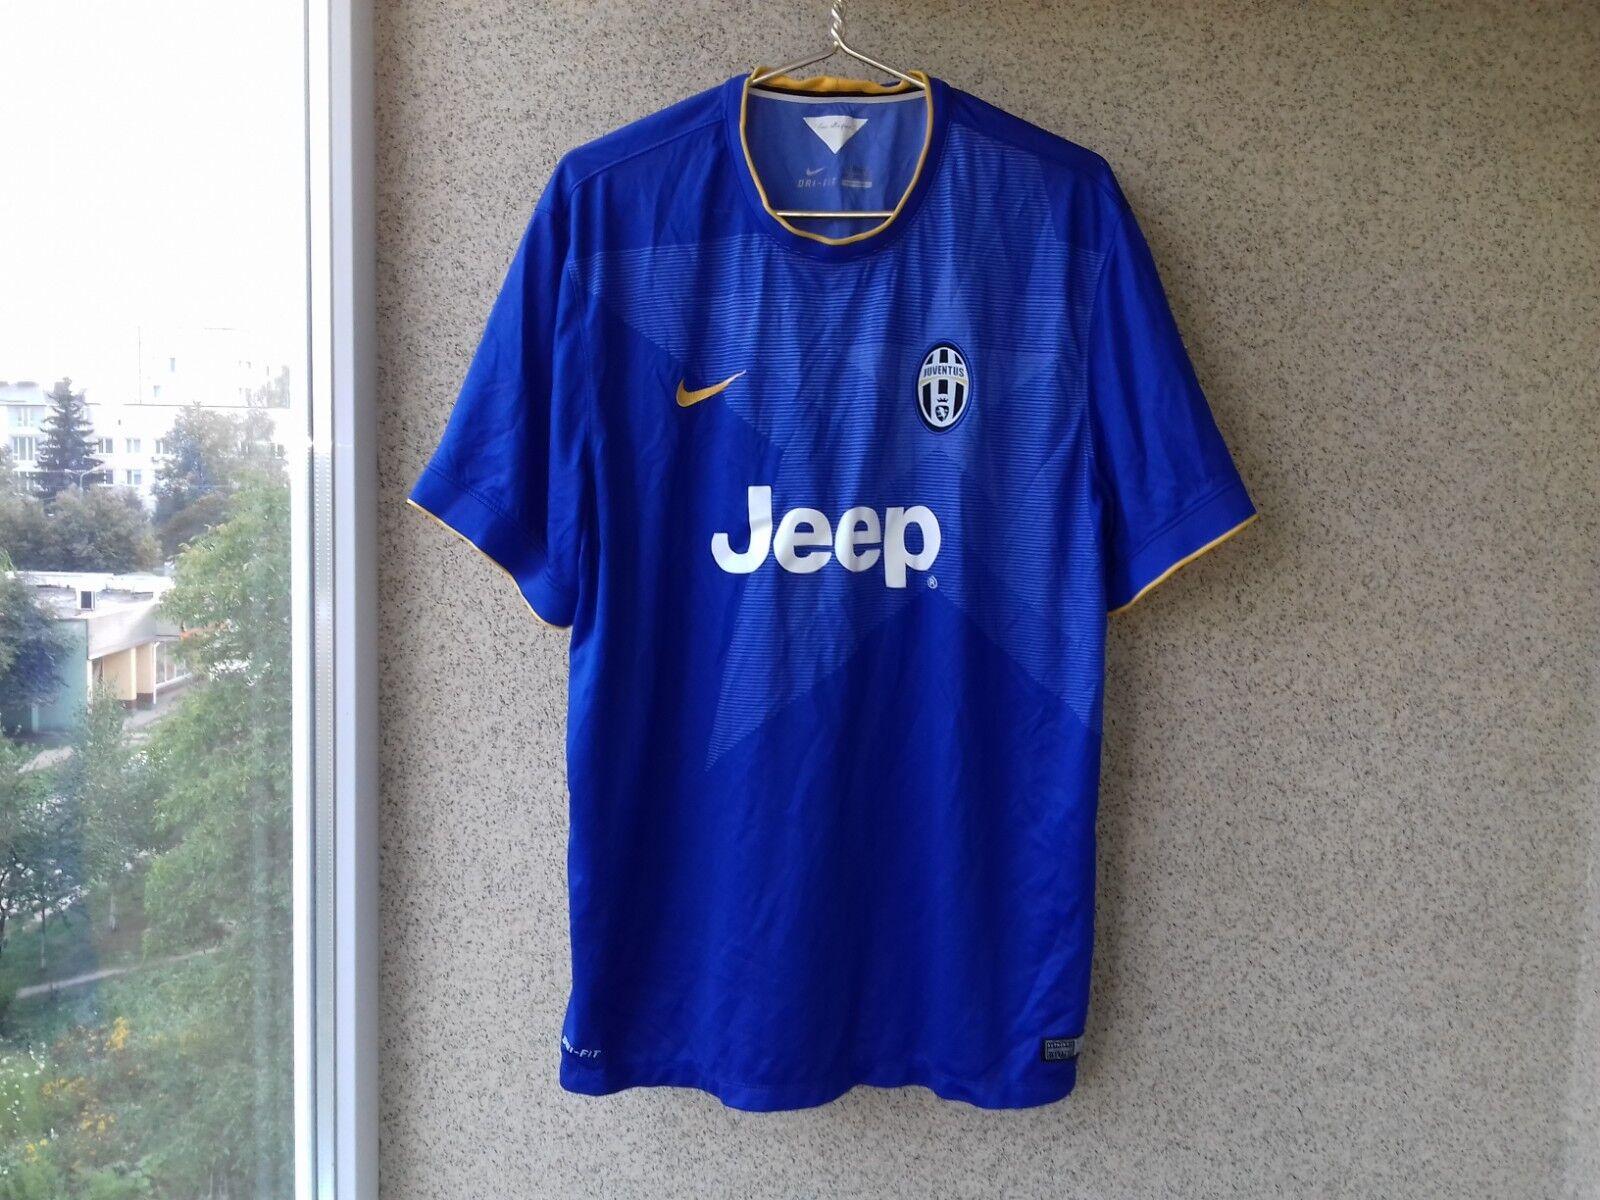 Juventus Away football shirt 2014 2015 JERSEY 2XL NIKE SOCCER CAMISETA ITALY